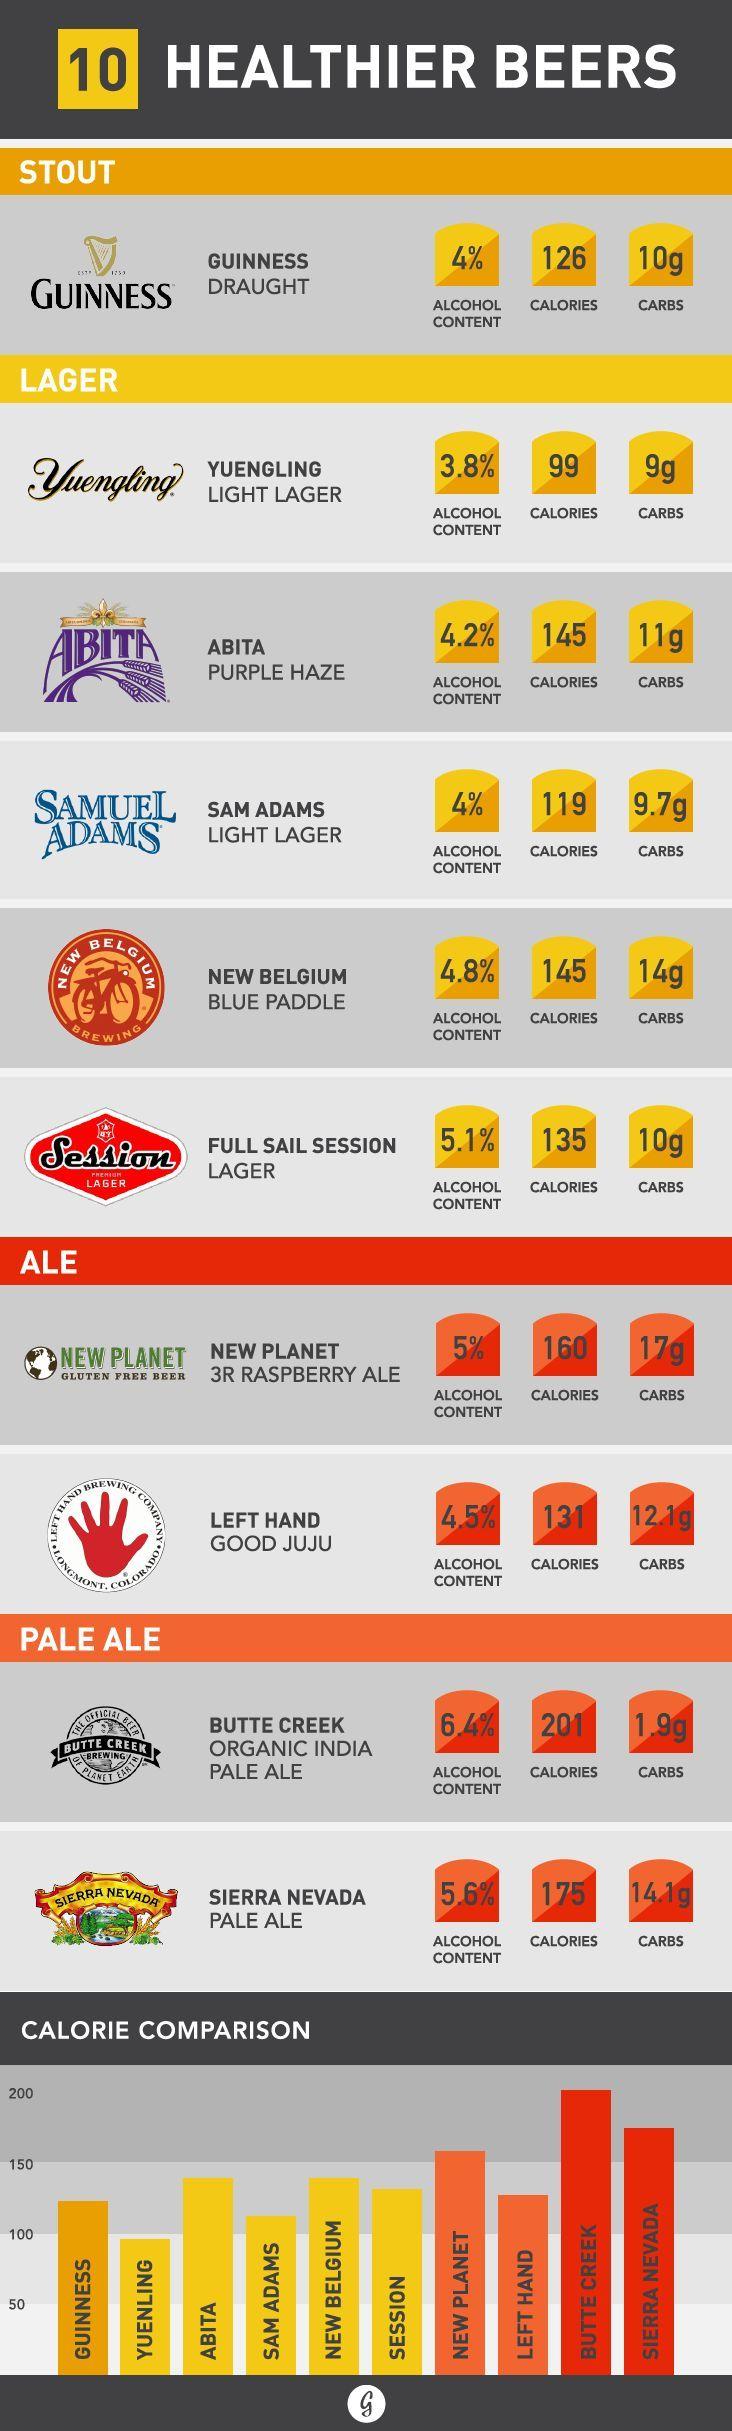 10 Surprisingly Healthy Beers #healthy #beer #drinks